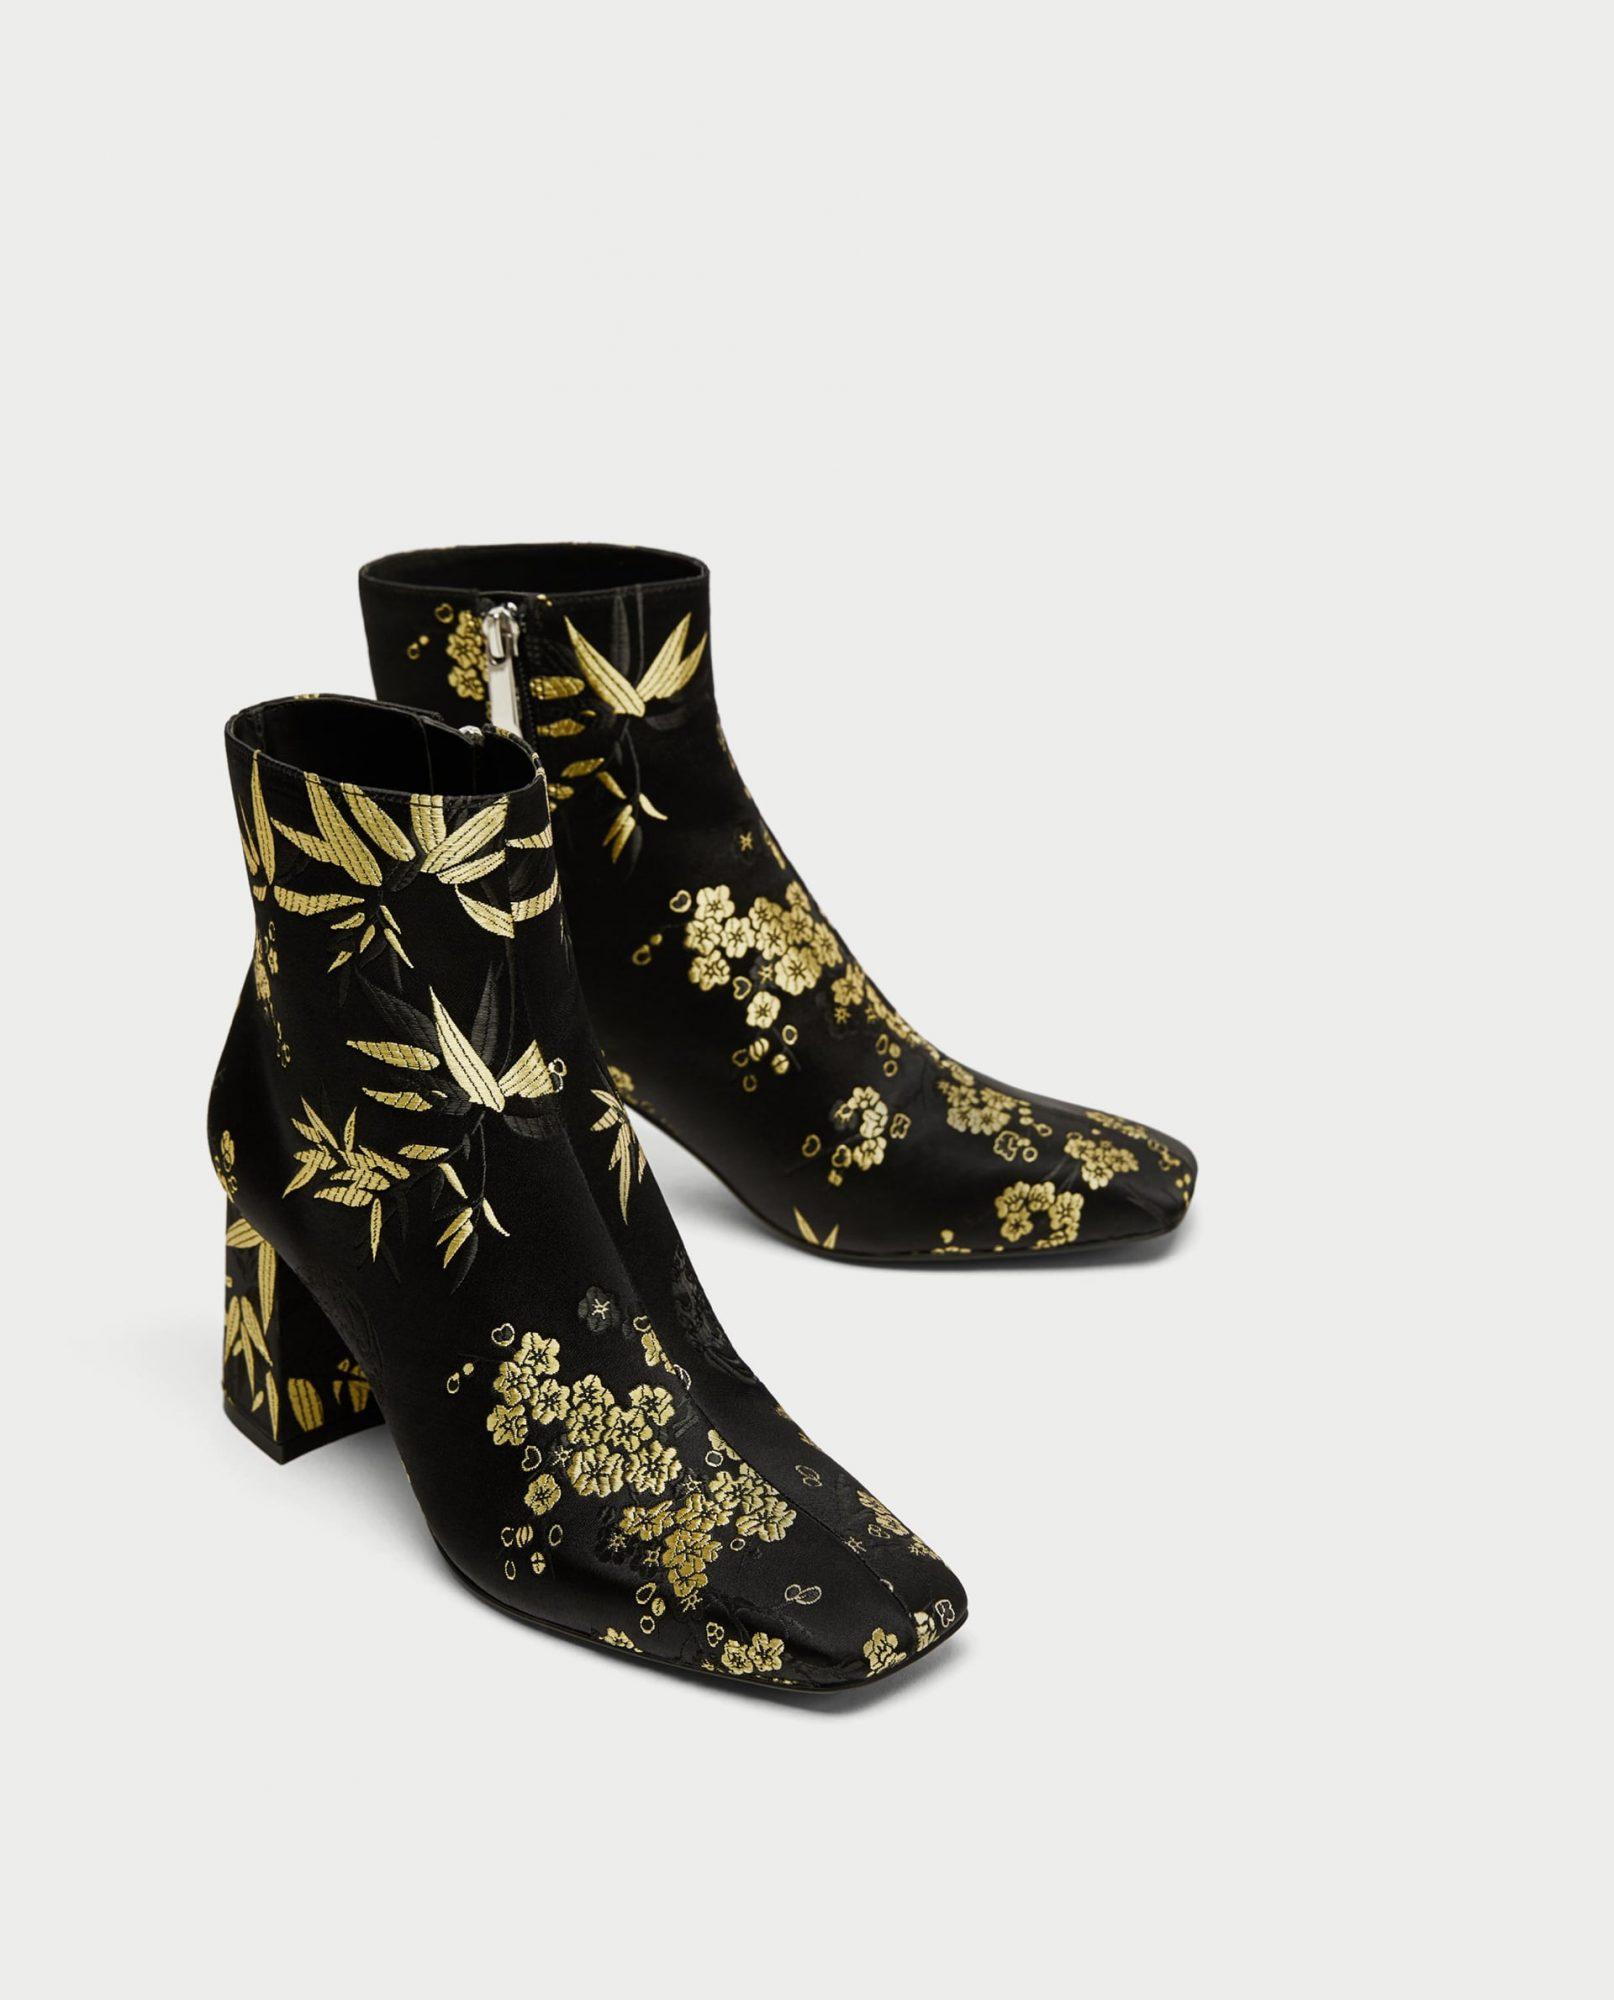 zara-boots.jpg